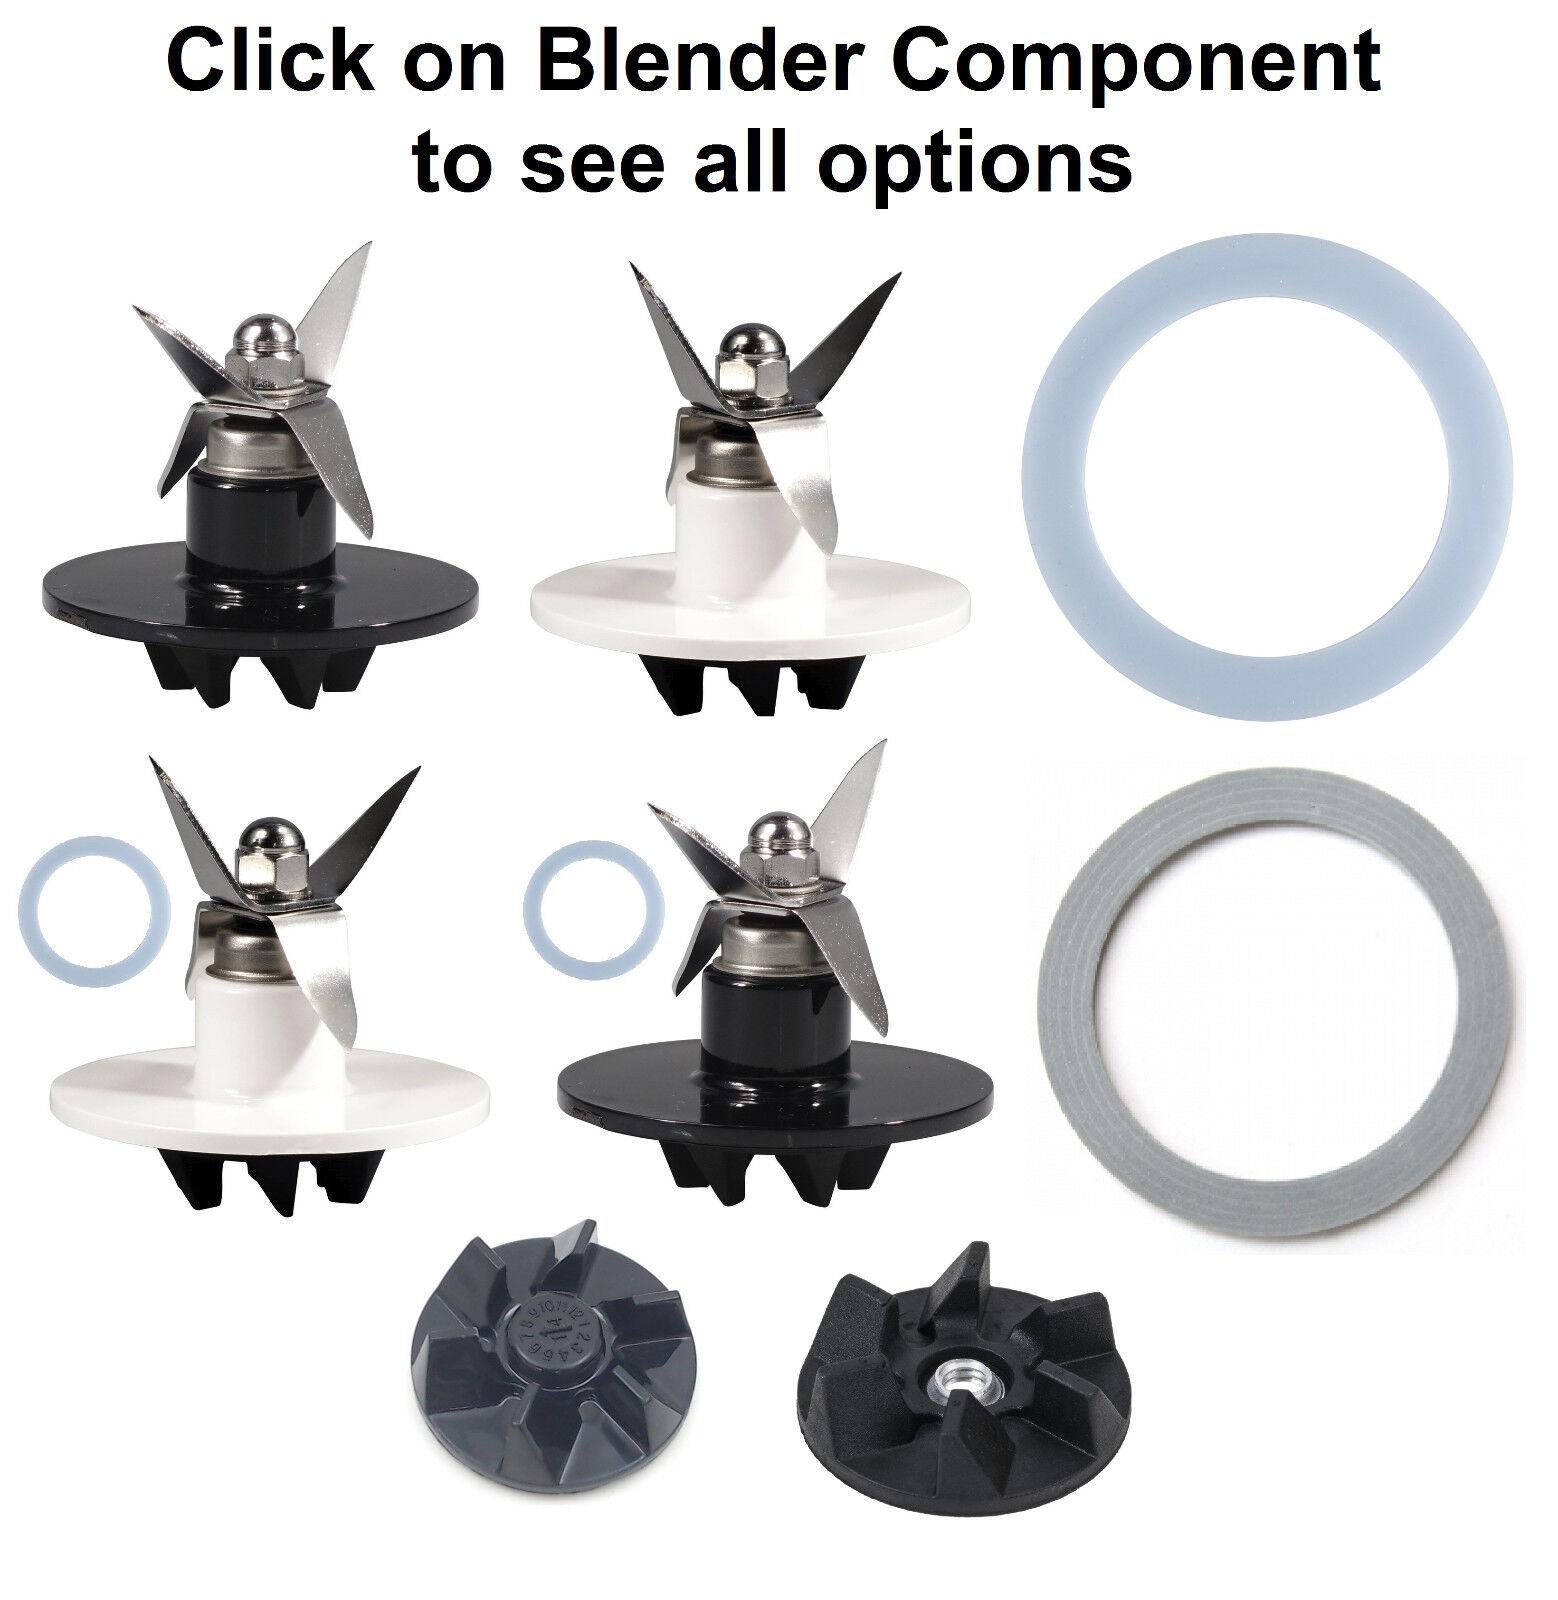 Replacement Compatible wit Cuisinart Blender,Gasket,Blade,Gear,Clutch,SPB-456-2B